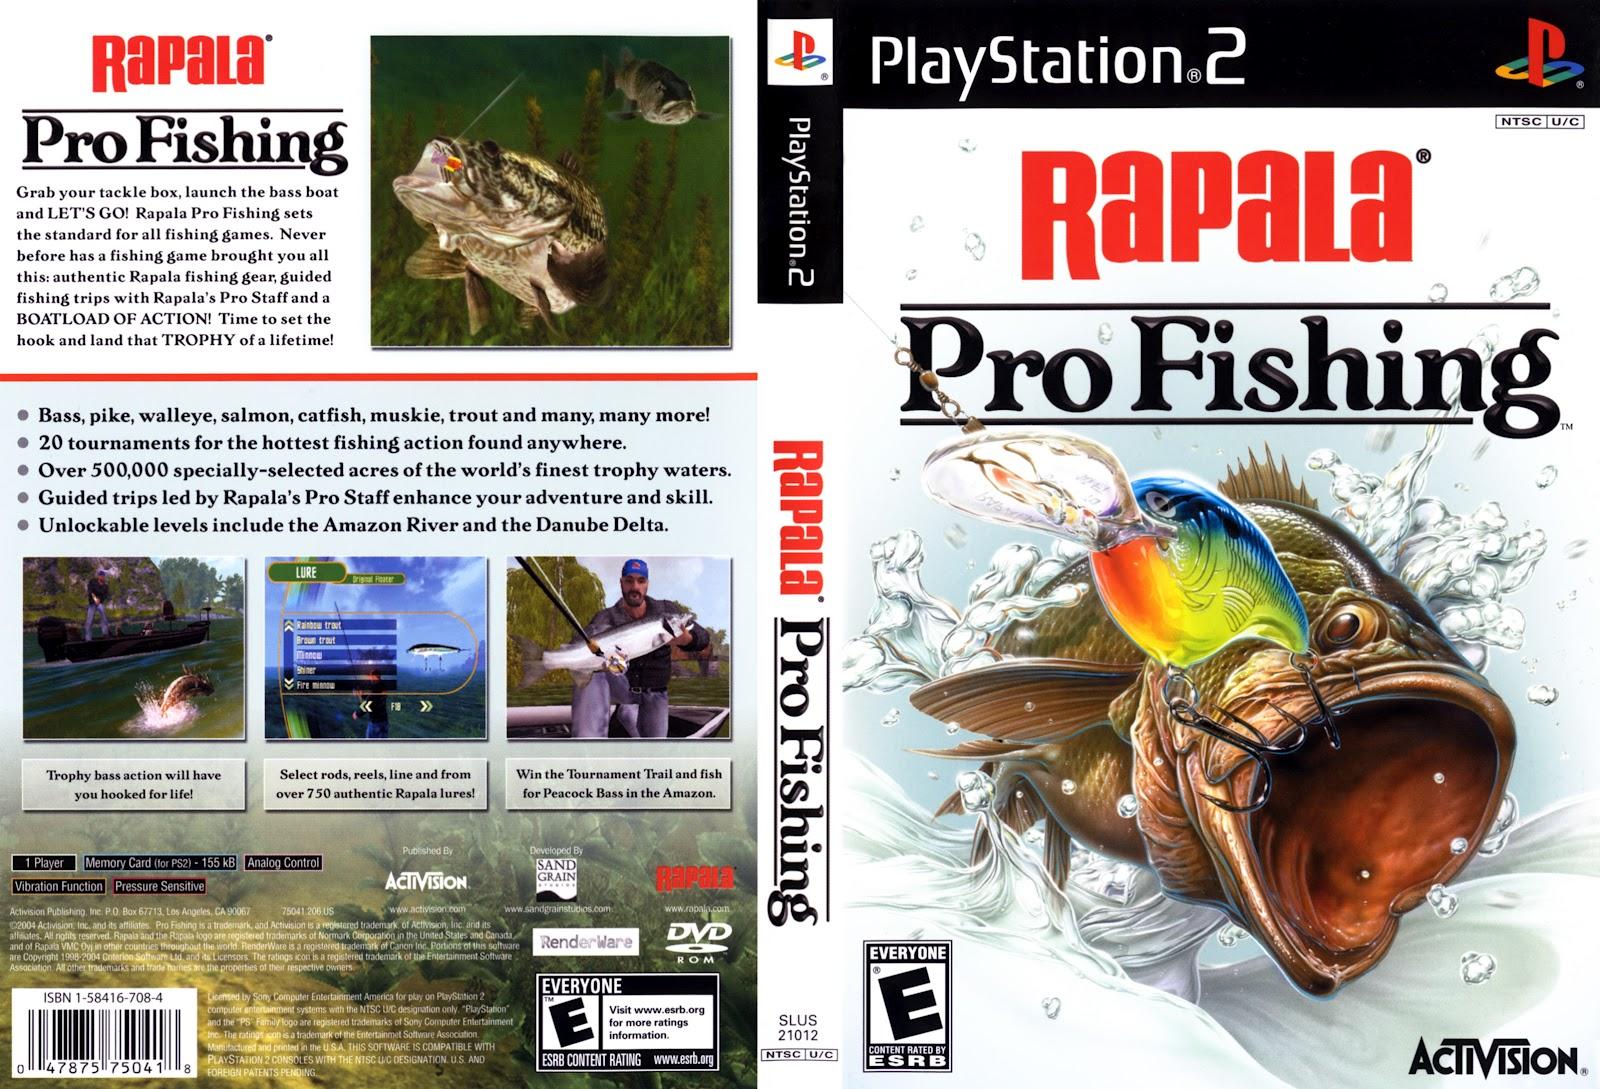 End ps2 games melhor blog de ps2 rapala pro fishing ps2 for Playstation 4 fishing games